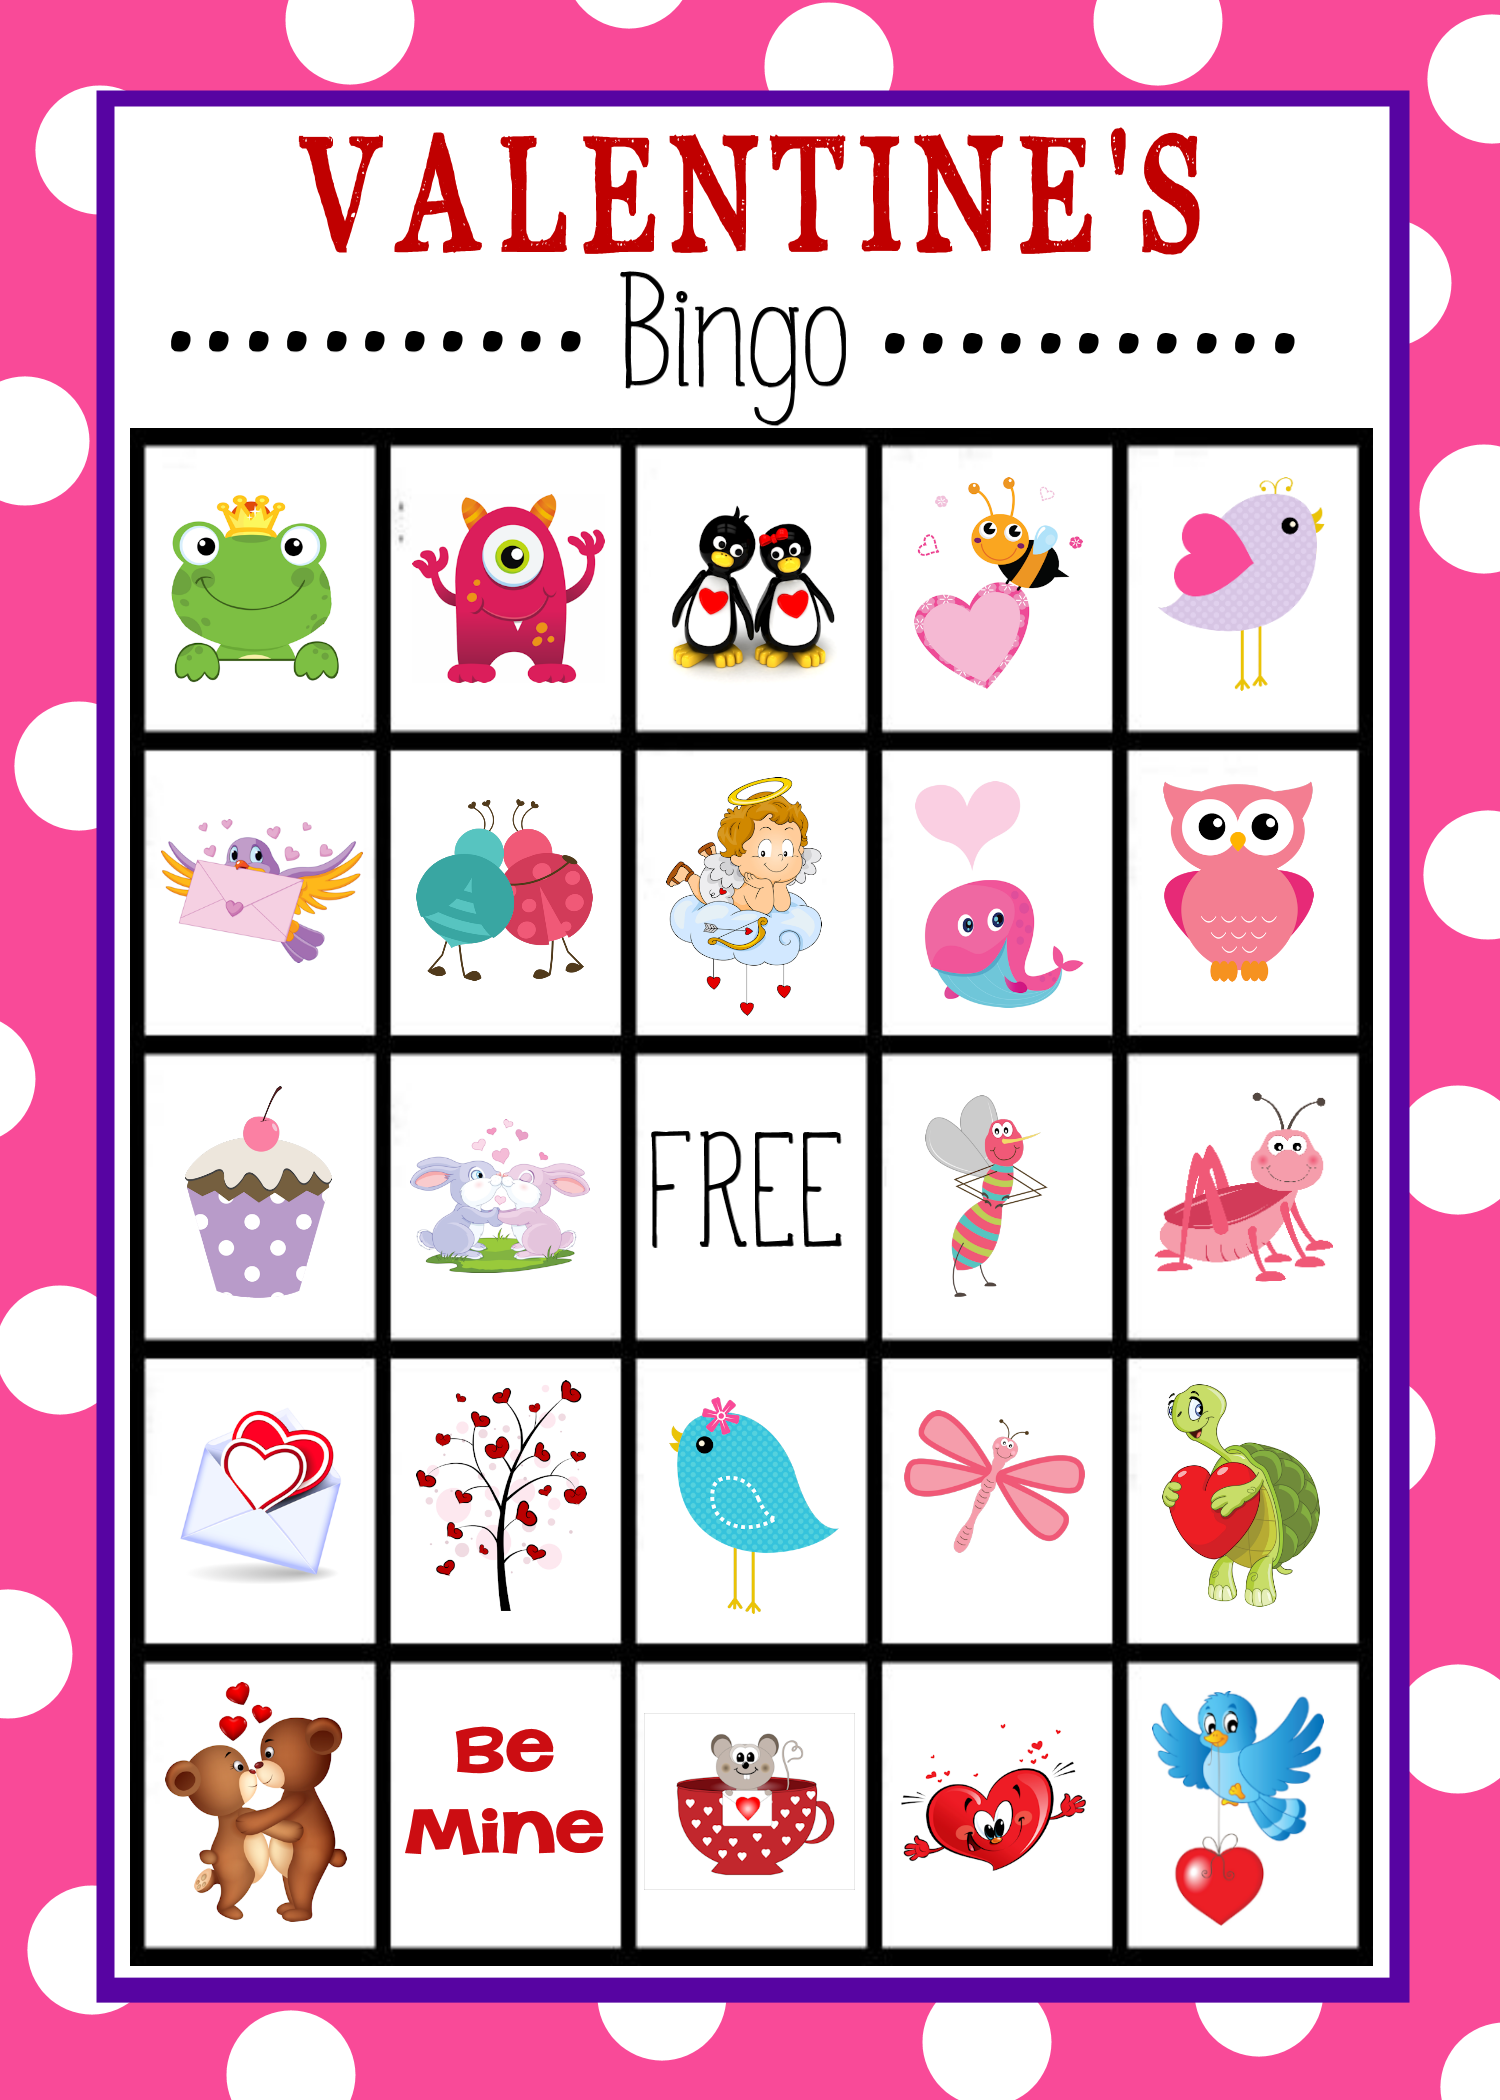 Valentine's Day Bingo Printables Free